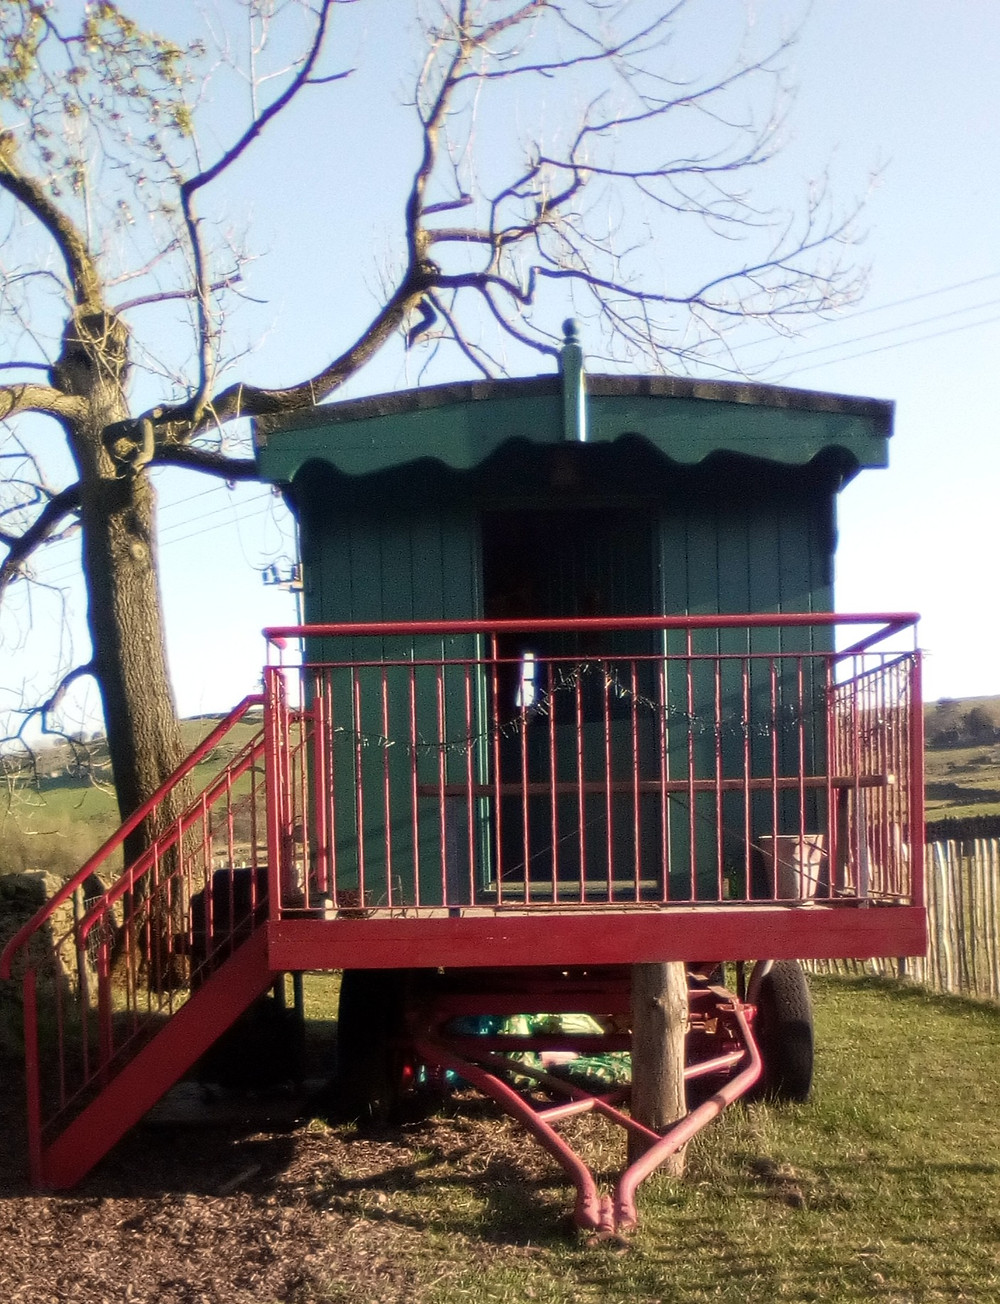 Rural shepherd's hut in the Peak District national park